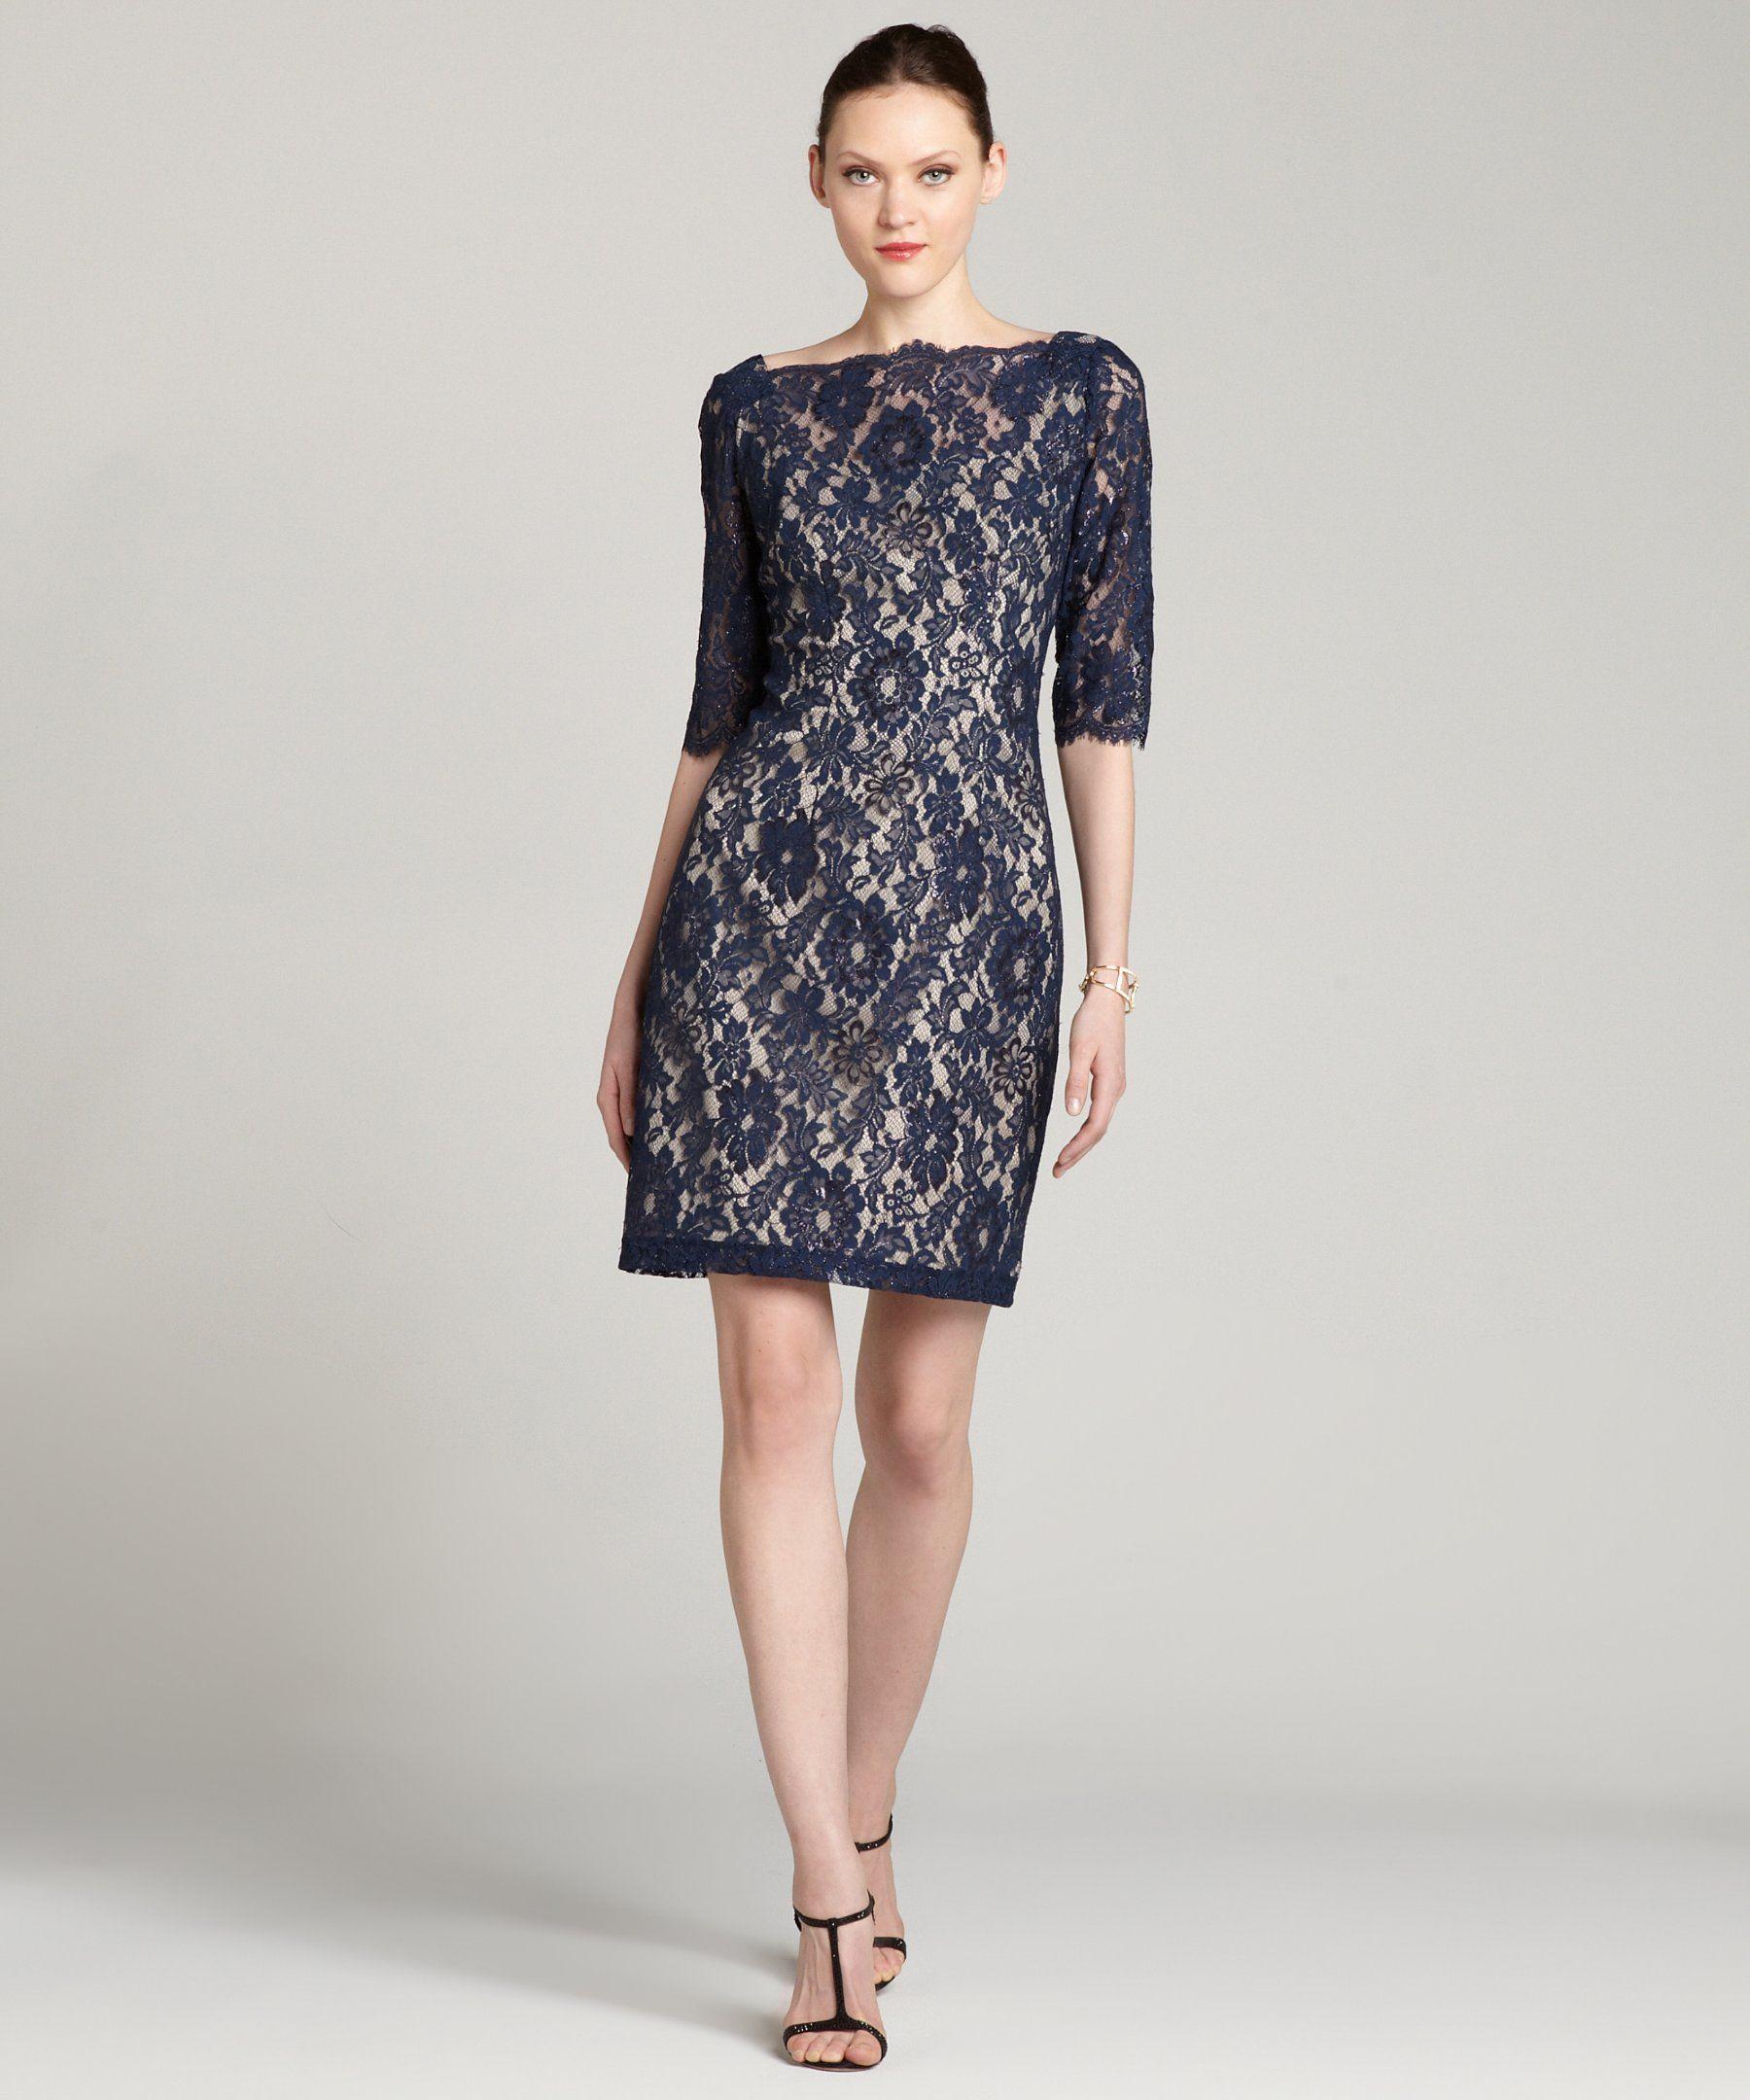 Single navy metallic lace 'Hepburn' 3/4 sleeve dress   BLUEFLY up to 70% off designer brands $111